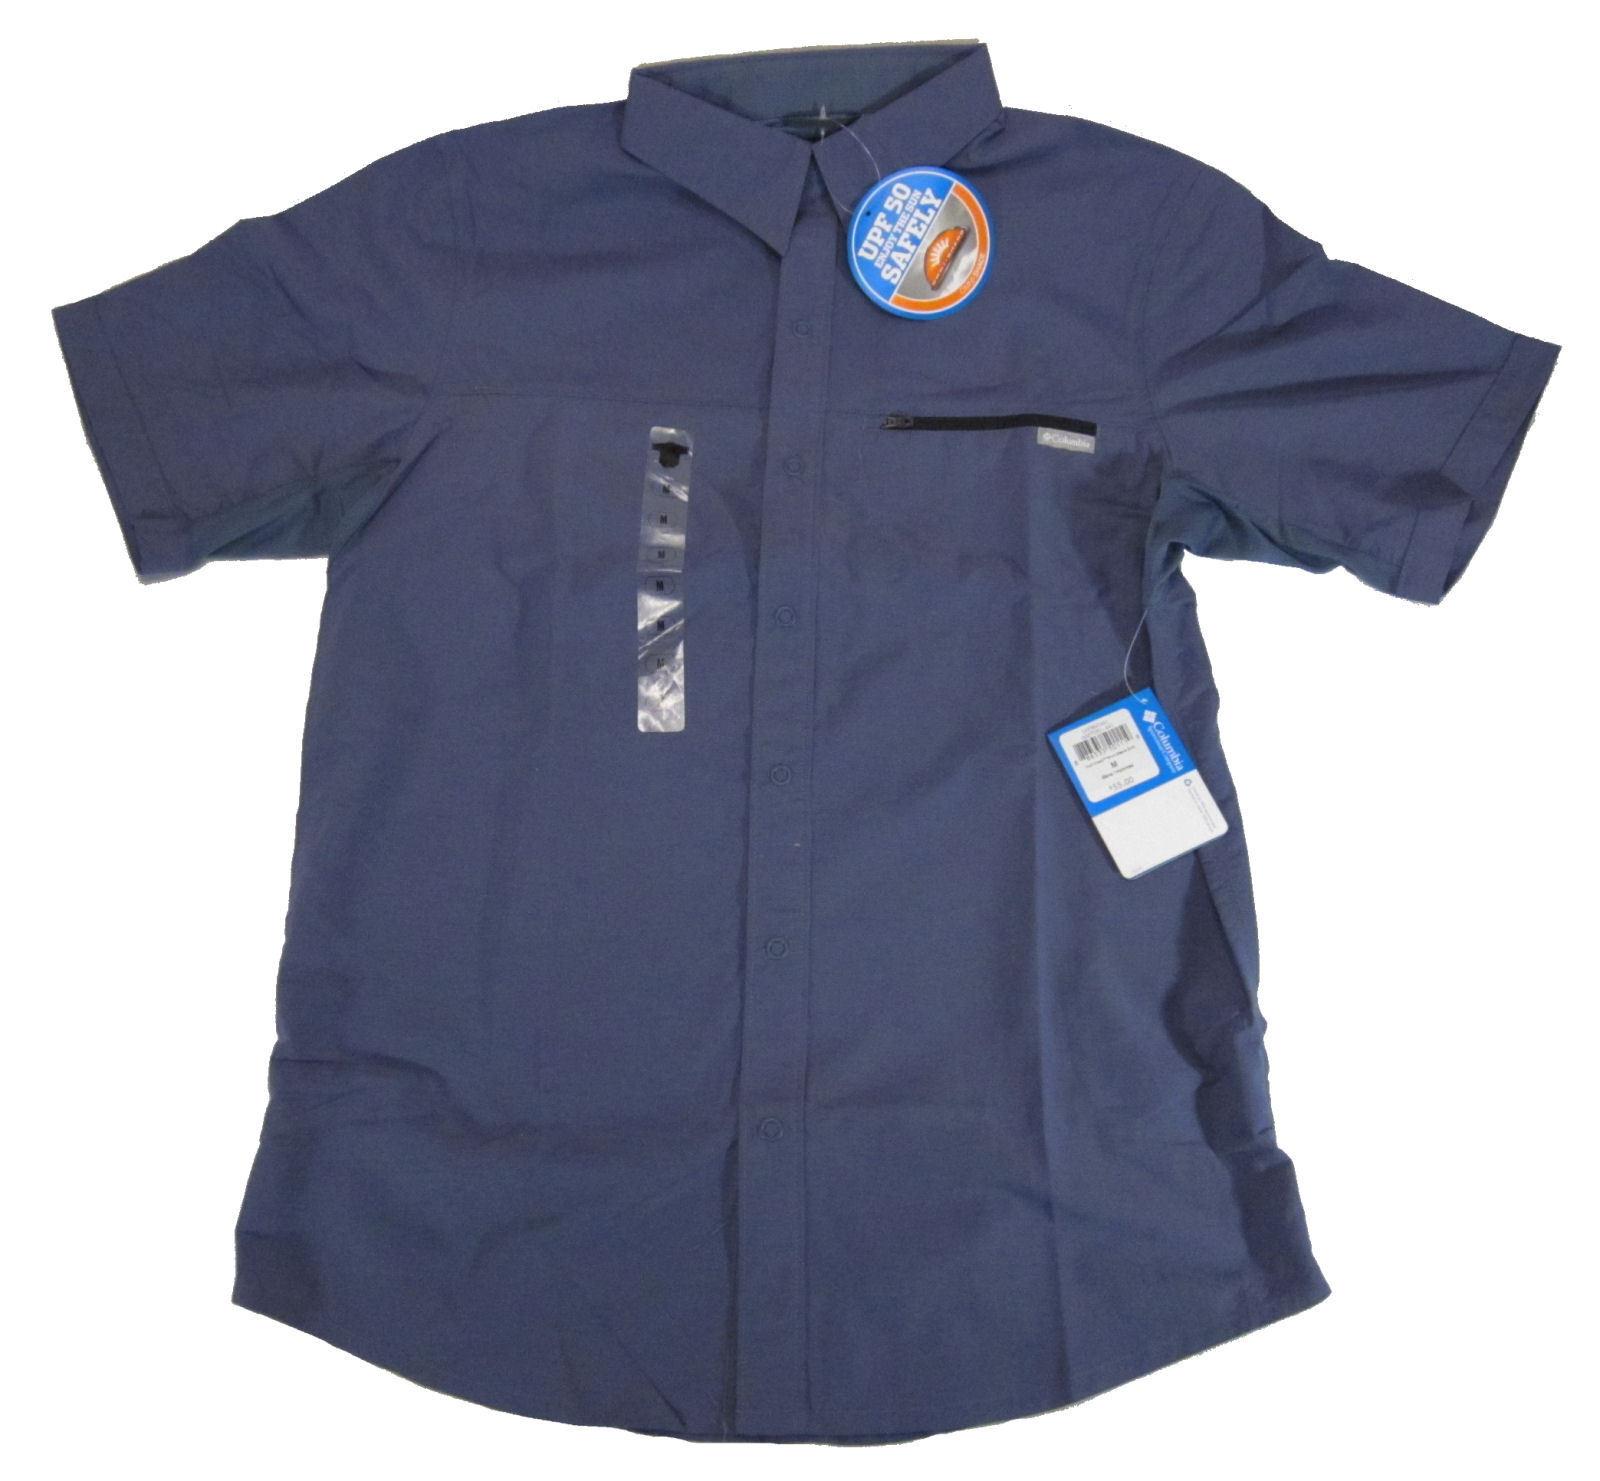 Columbia Cool Creek Short Sleeve Shirt, Medium, Slate bluee